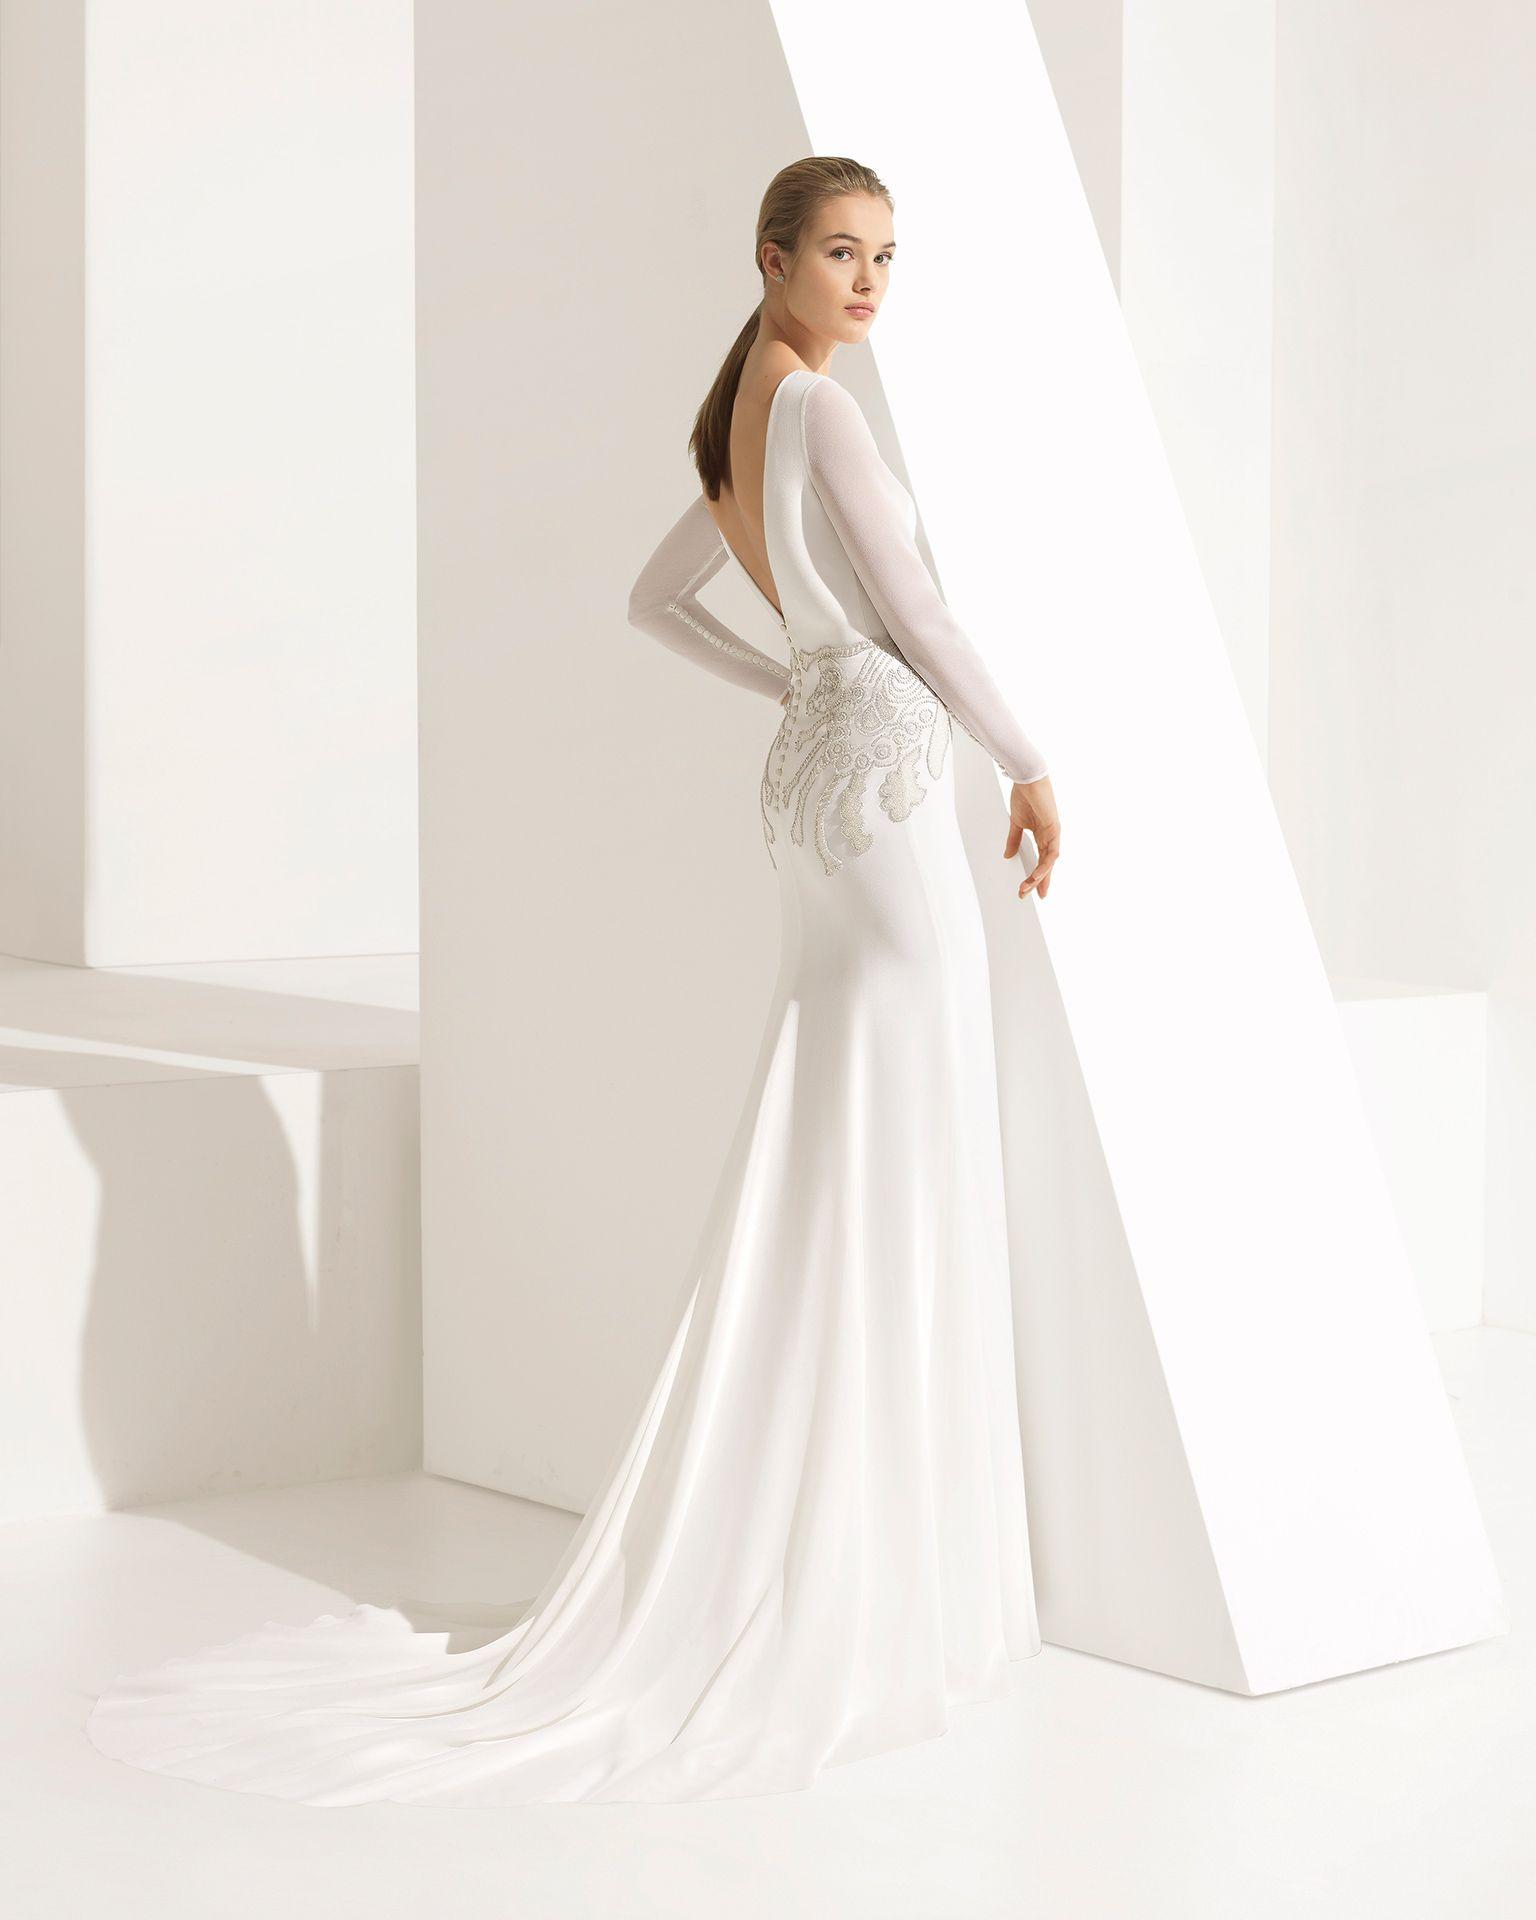 PAISAJE - Hochzeit 2018. Kollektion Rosa Clará Couture | Rosa clará ...